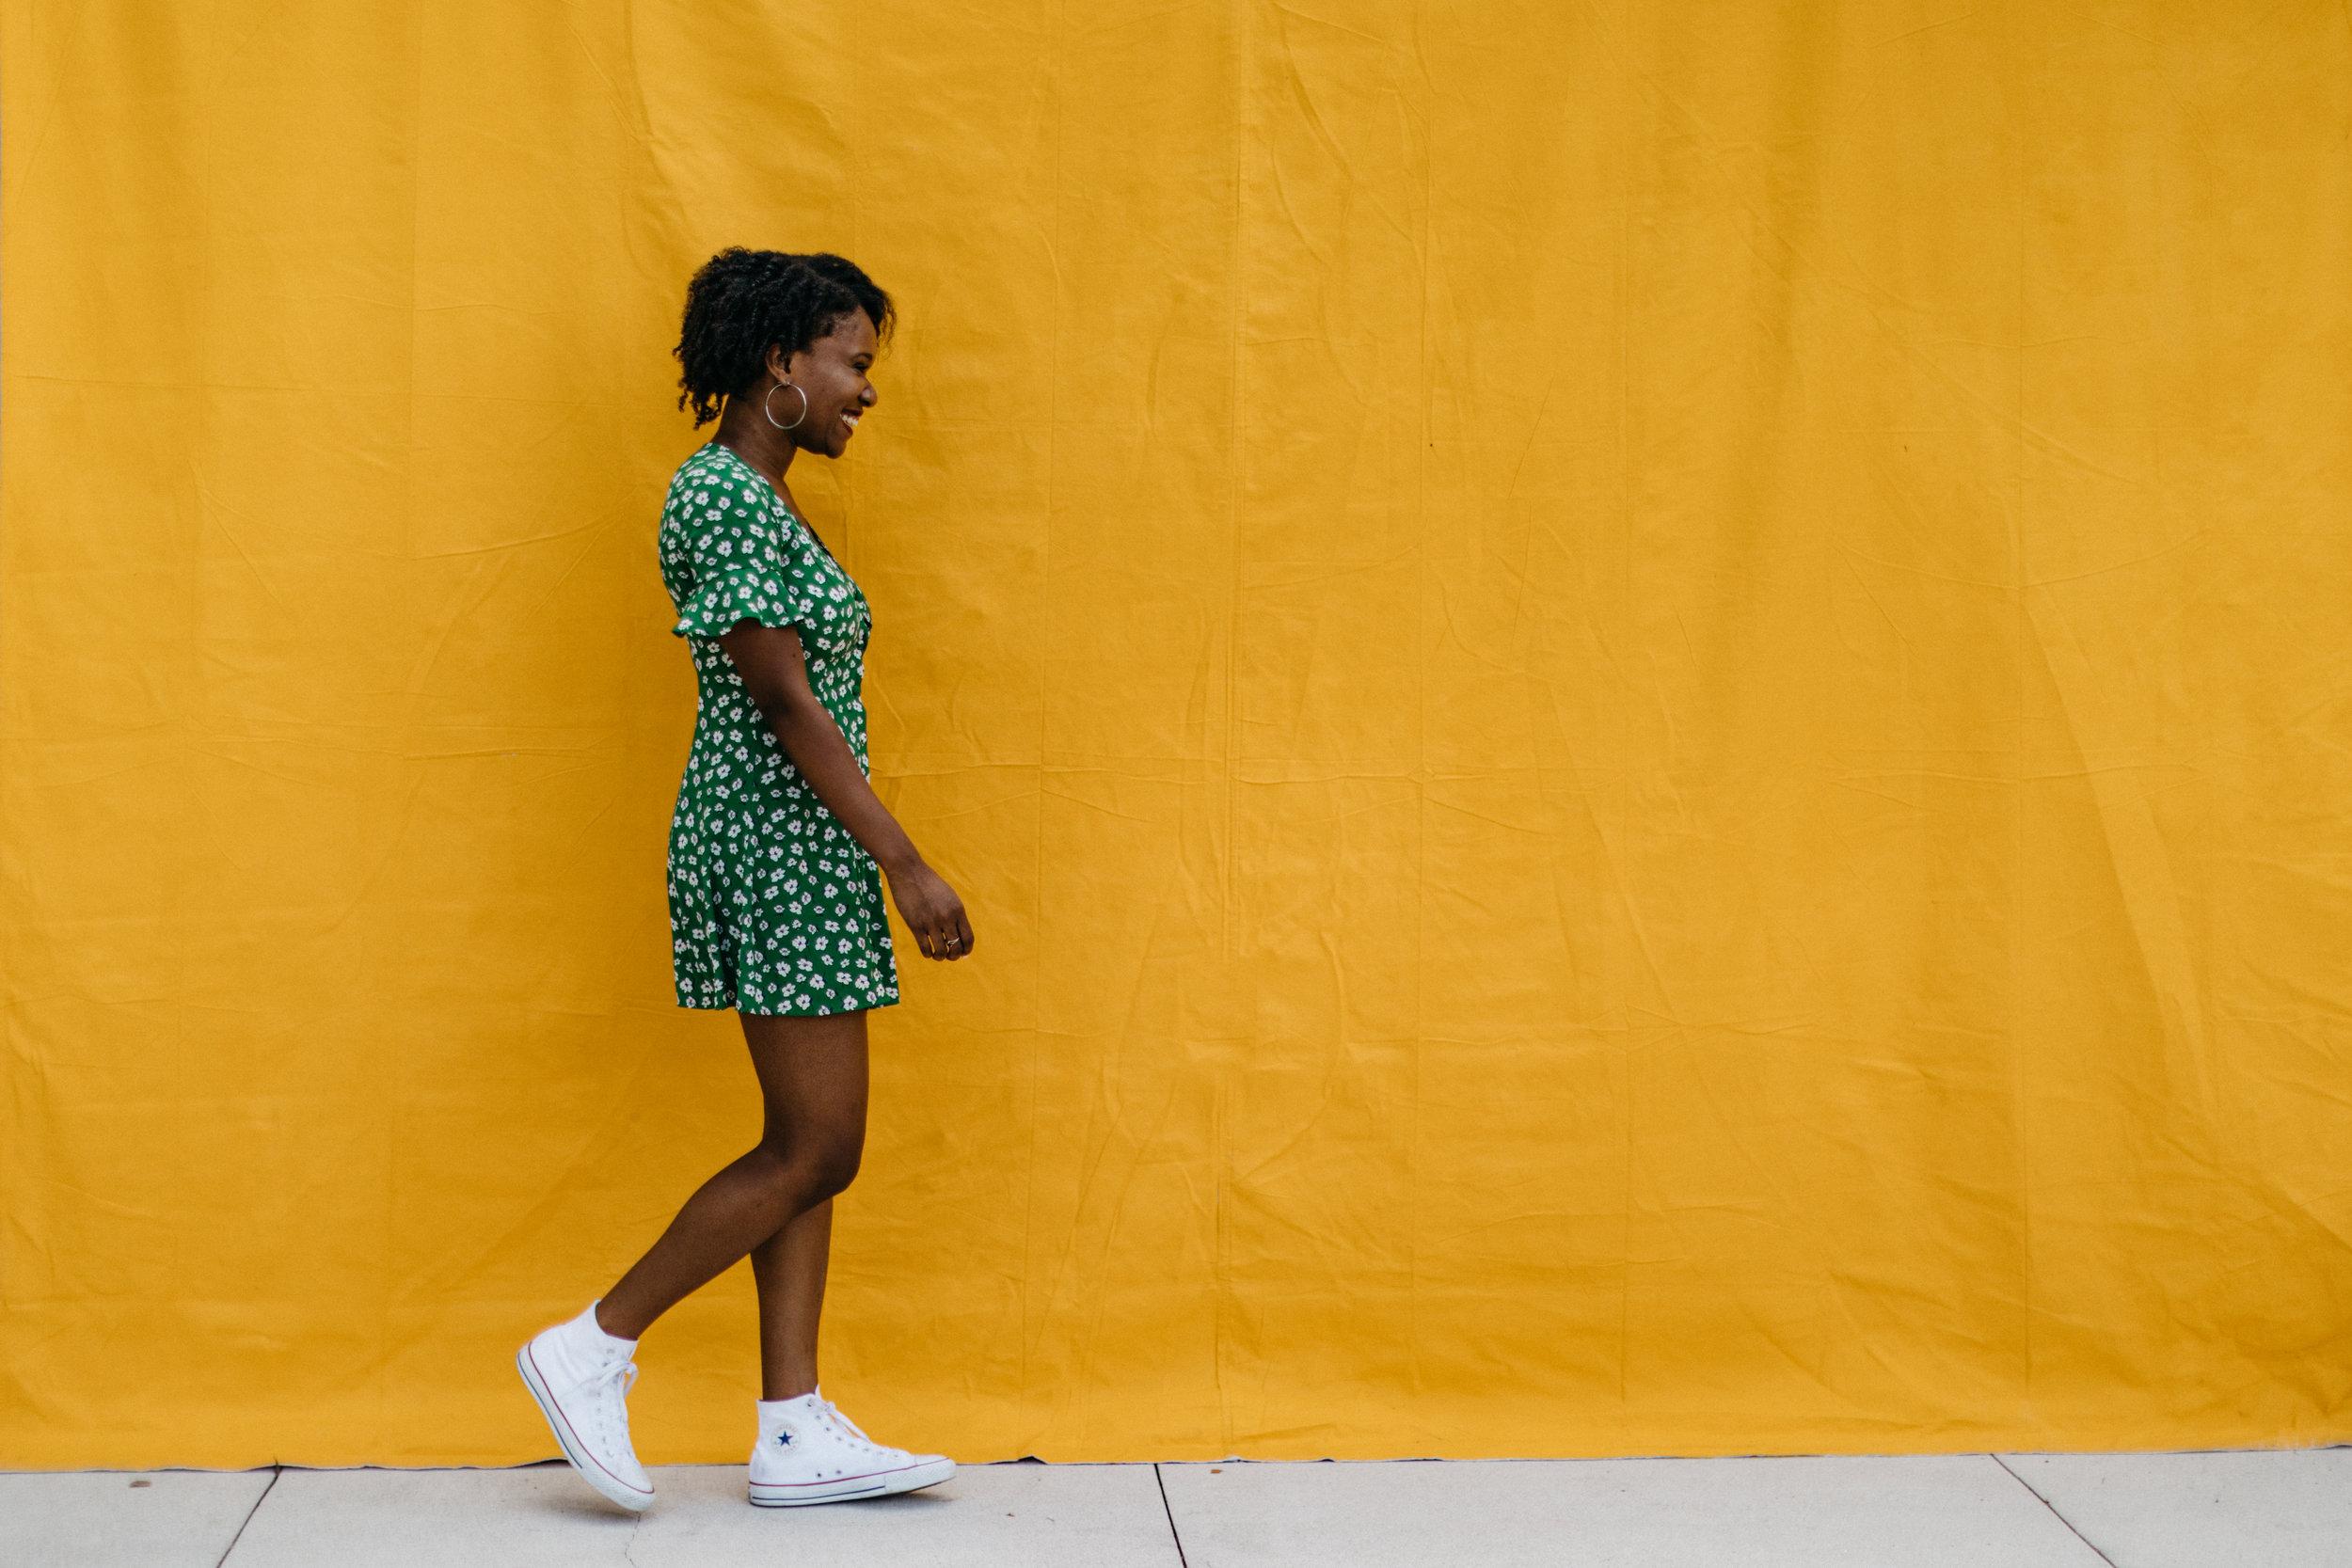 walk with purpose -